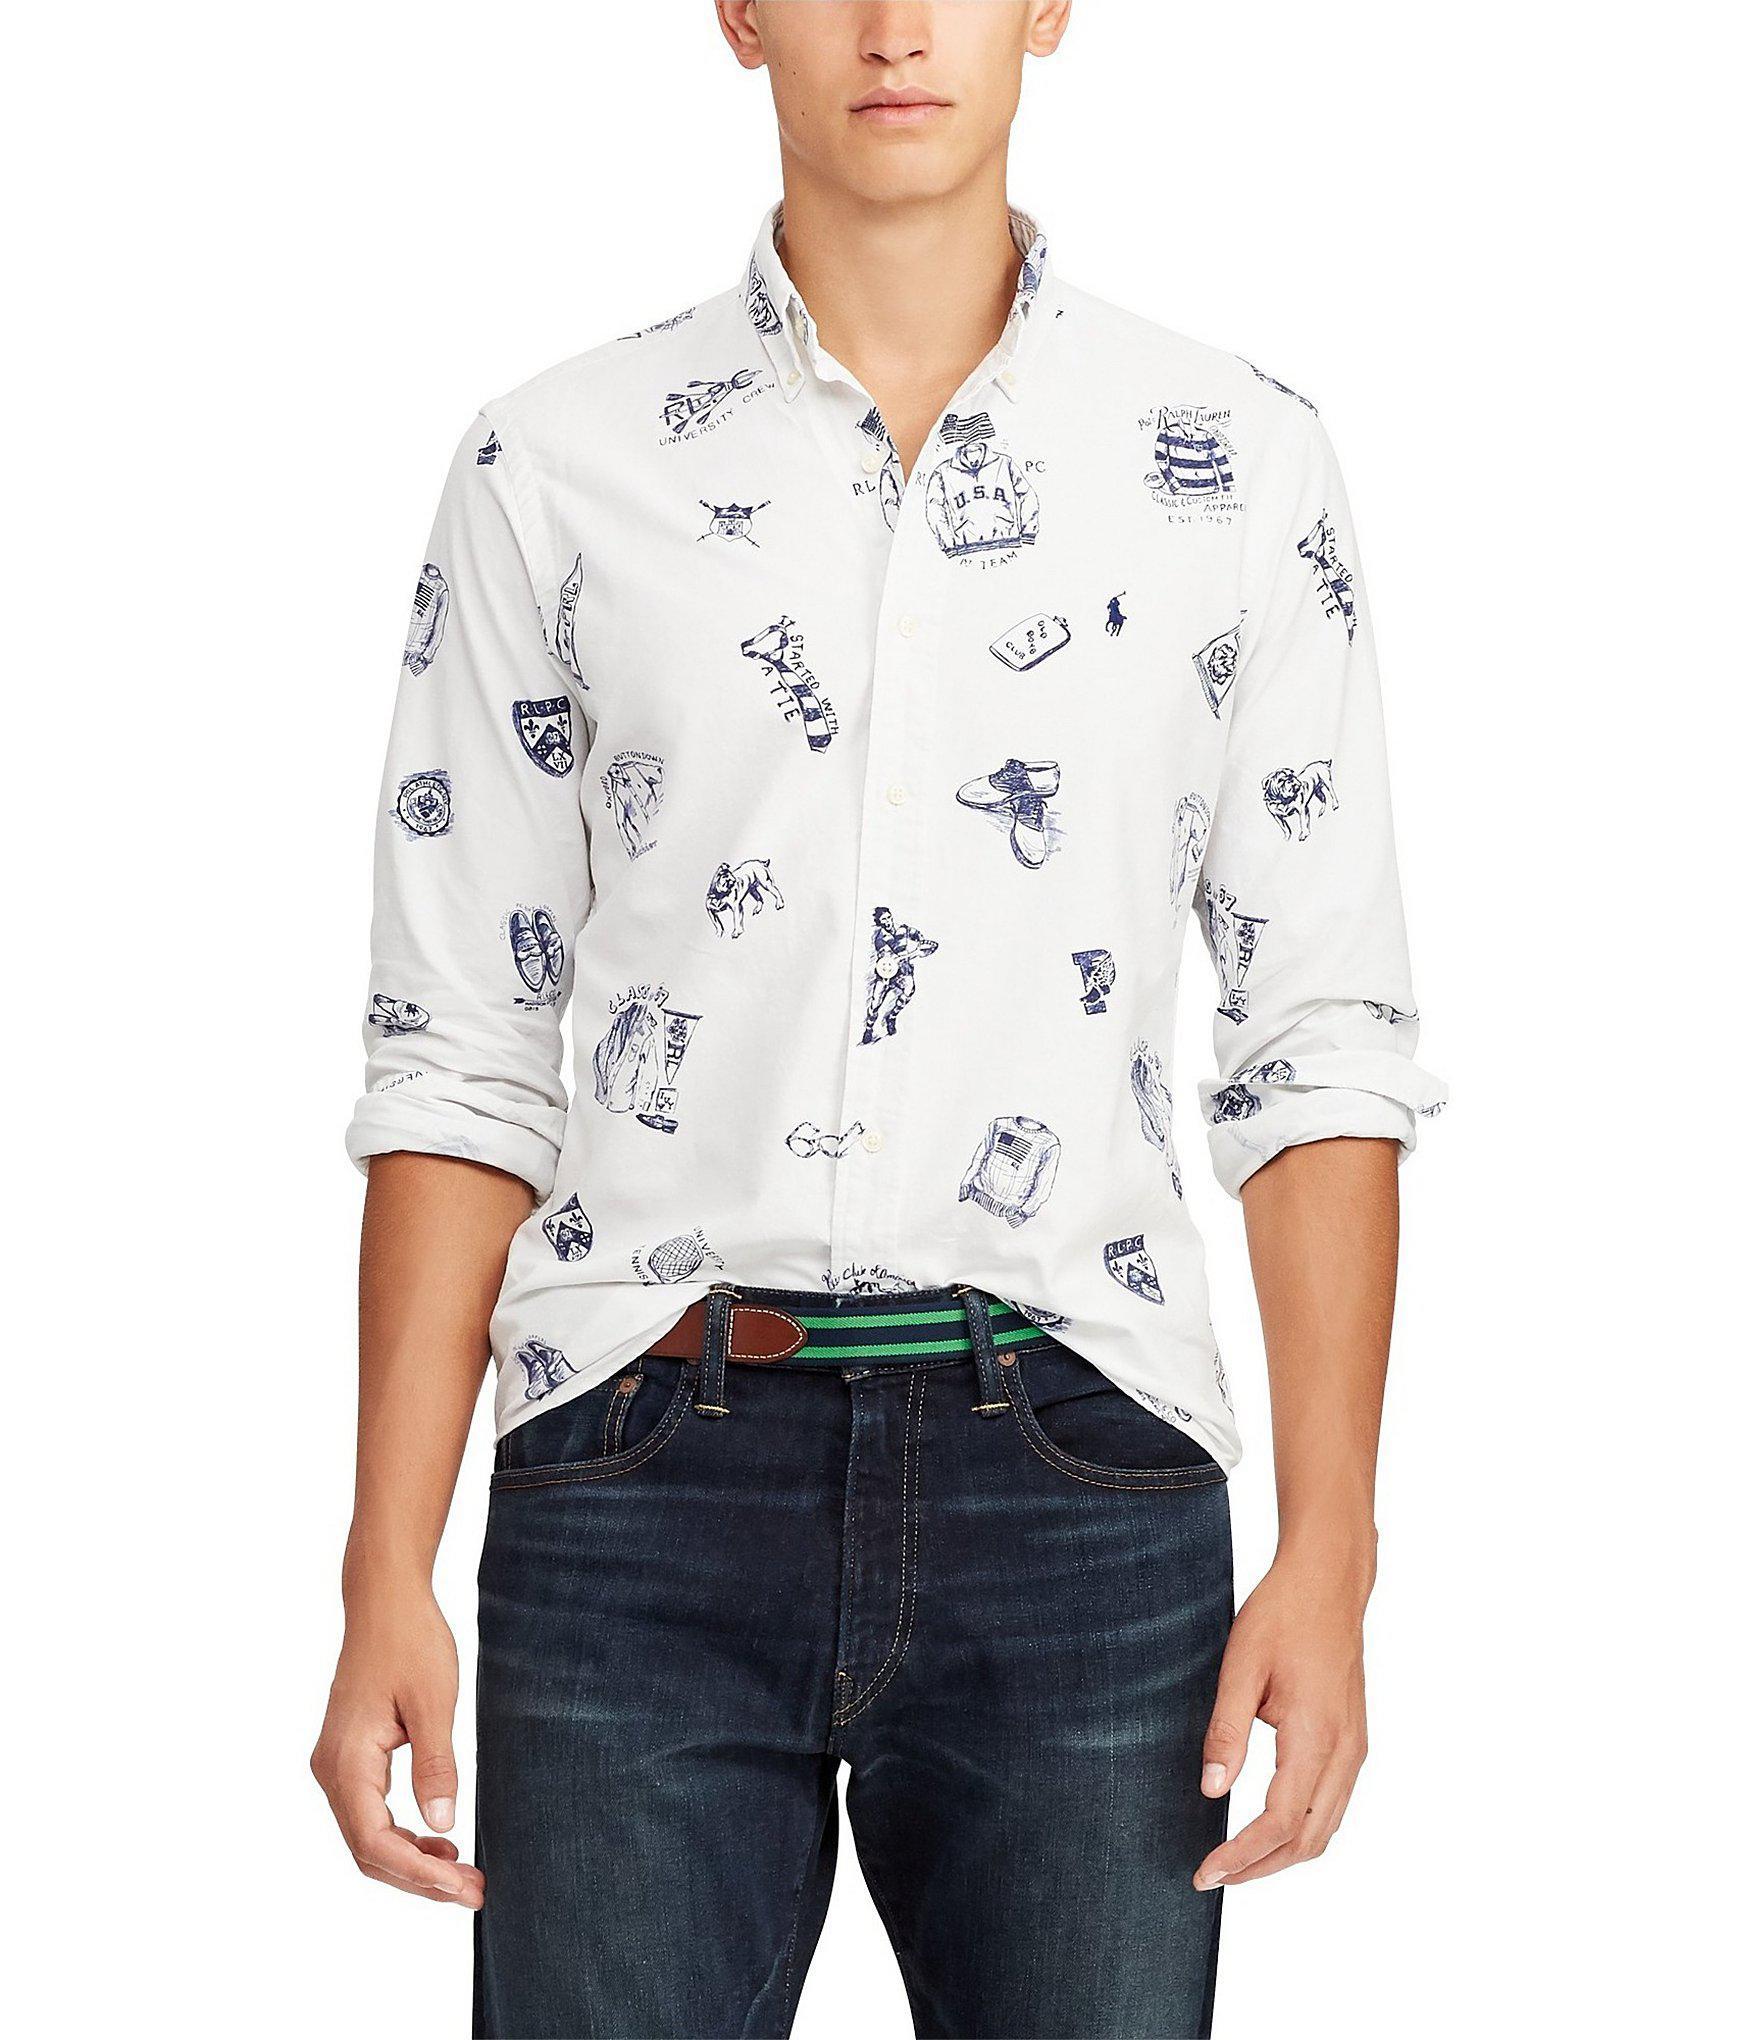 4116d451 Lyst - Polo Ralph Lauren Printed Oxford Long-sleeve Woven Shirt for Men